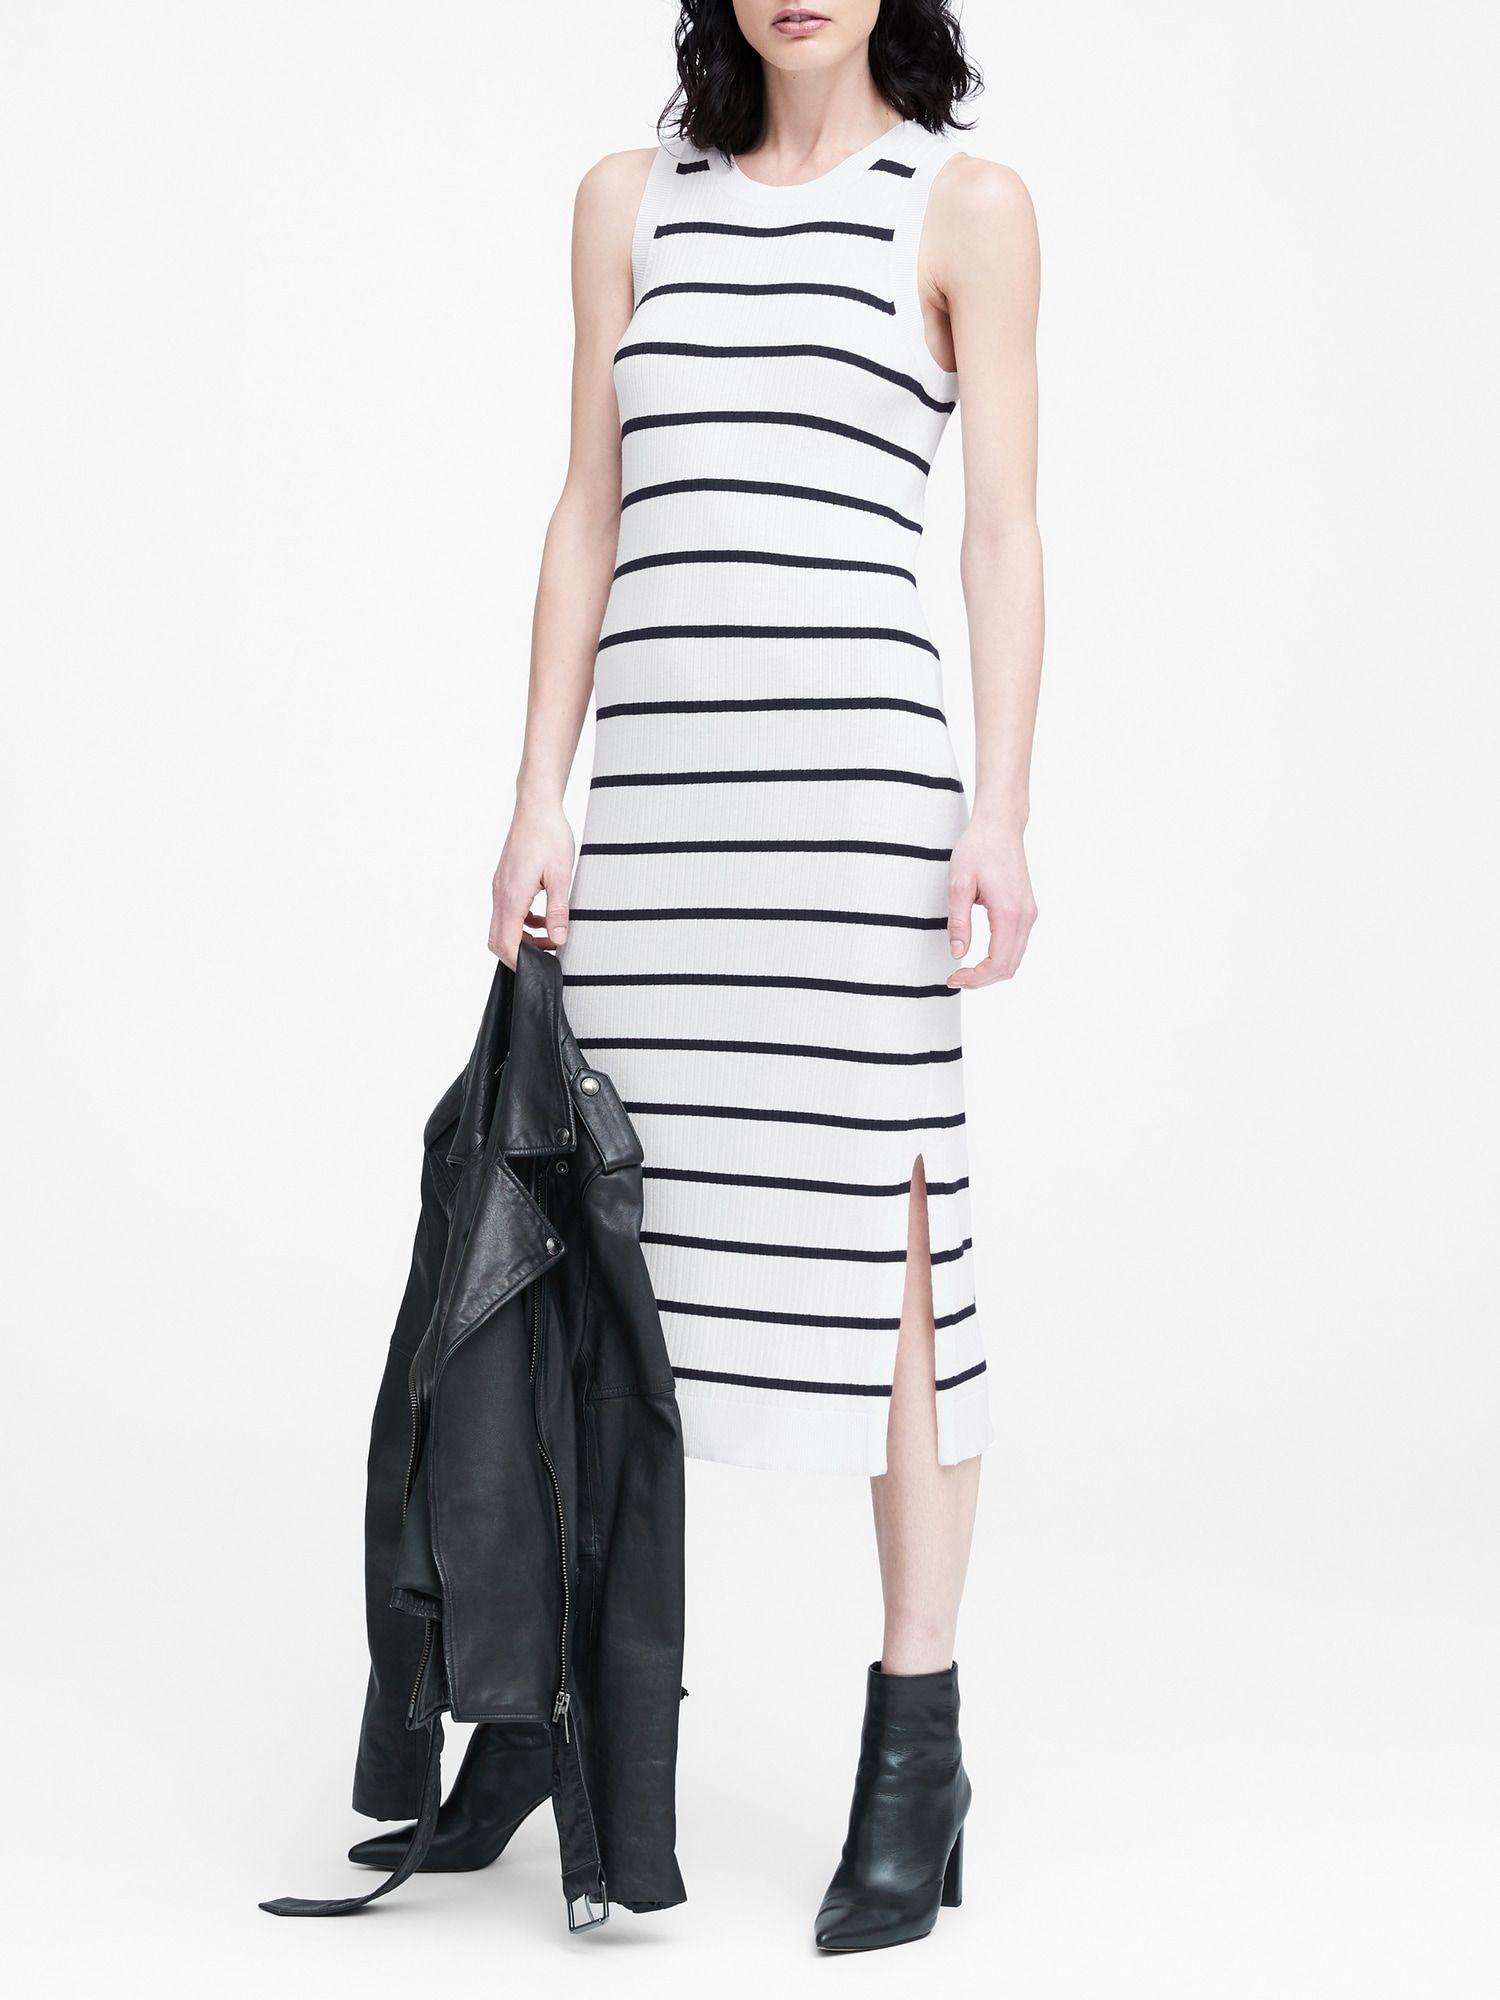 Product Striped Knit Dress Striped Knit Women Clothes Sale [ 2000 x 1500 Pixel ]